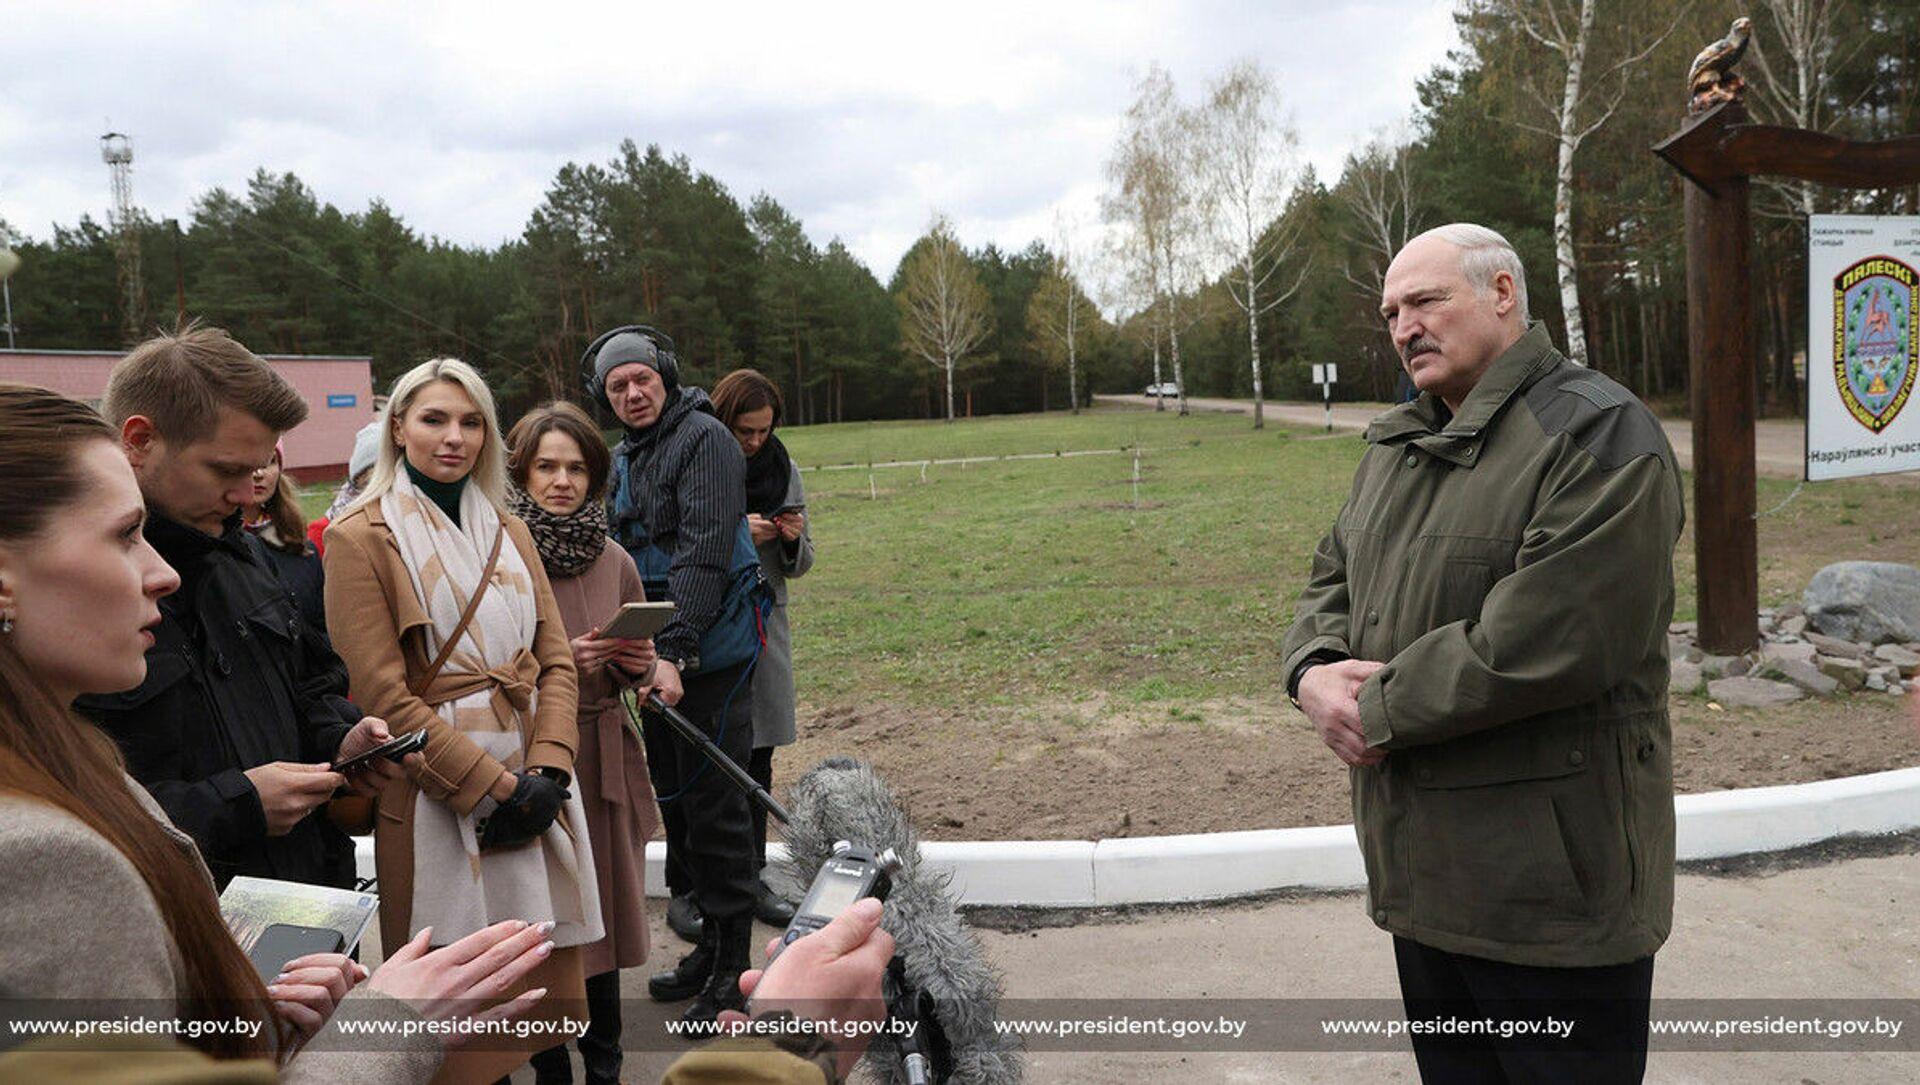 Президент Беларуси Александр Лукашенко общается с журналистами в Наровлянском районе - Sputnik Беларусь, 1920, 24.04.2021